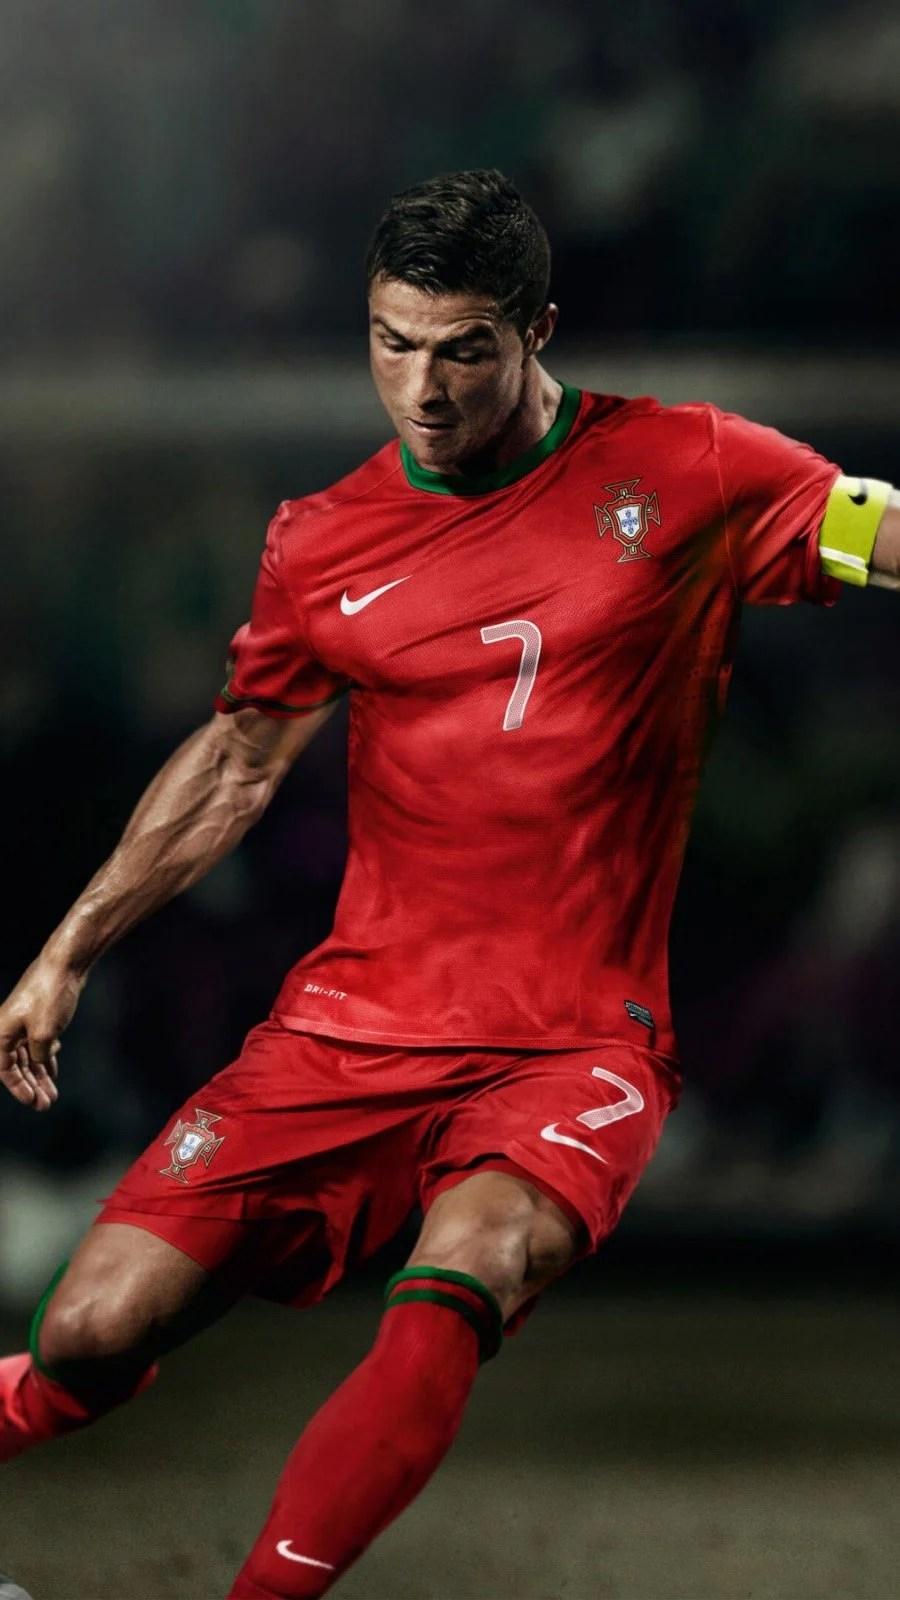 Ronaldo Vertical : ronaldo, vertical, Soccer, Player, Cristiano, Ronaldo, Wallpaper, ID:2772